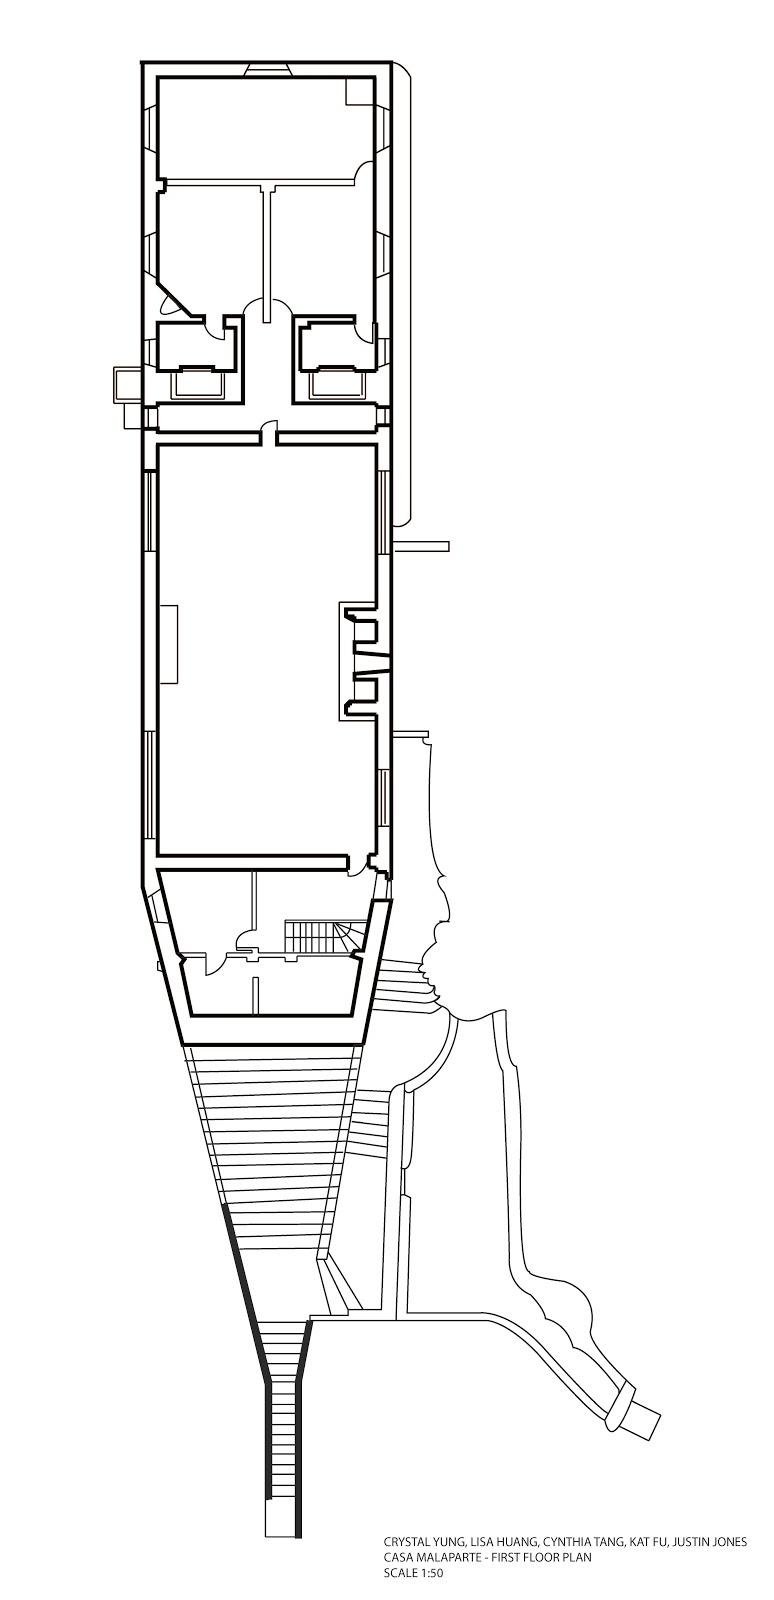 casa malaparte gallery ground floor plan